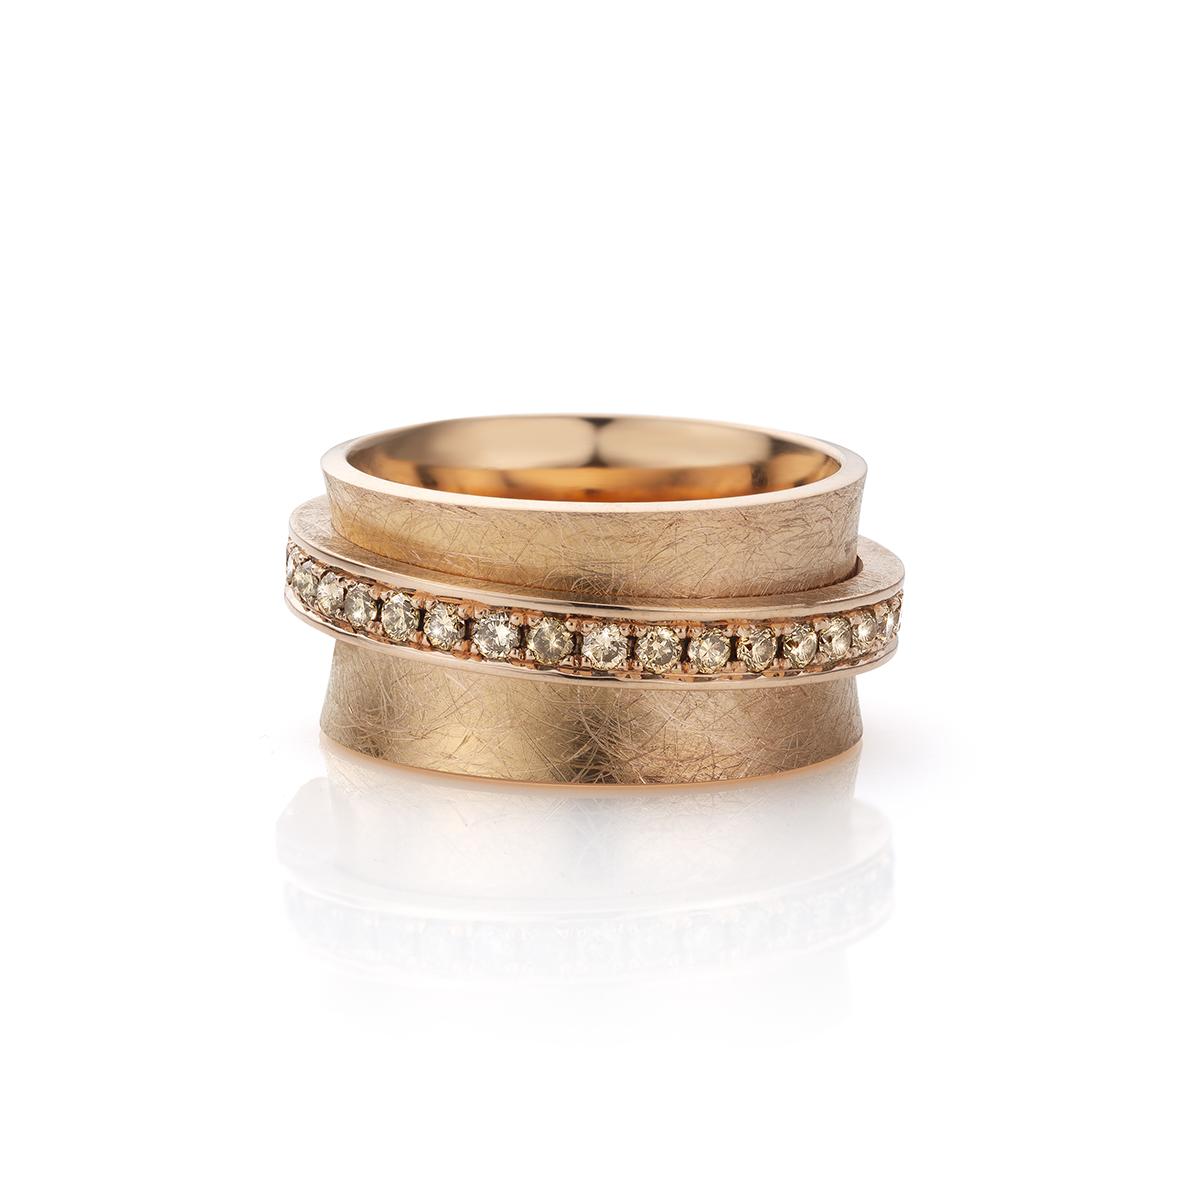 MOYA Carrouselring rood goud met champagne kleurige diamanten